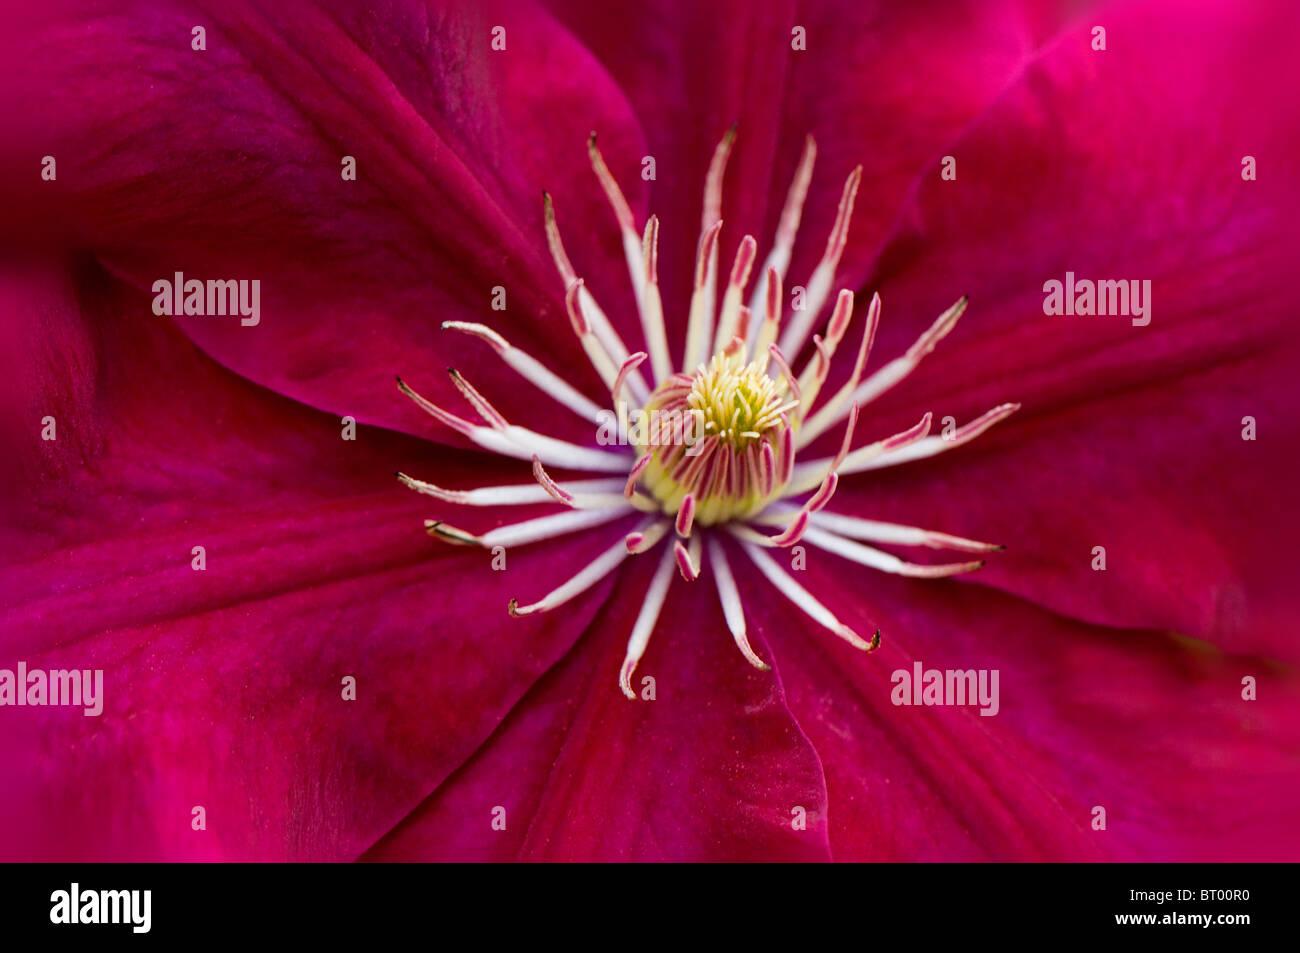 A close-up image of the beautiful Clematis 'Ville De Lyon' flower - Stock Image